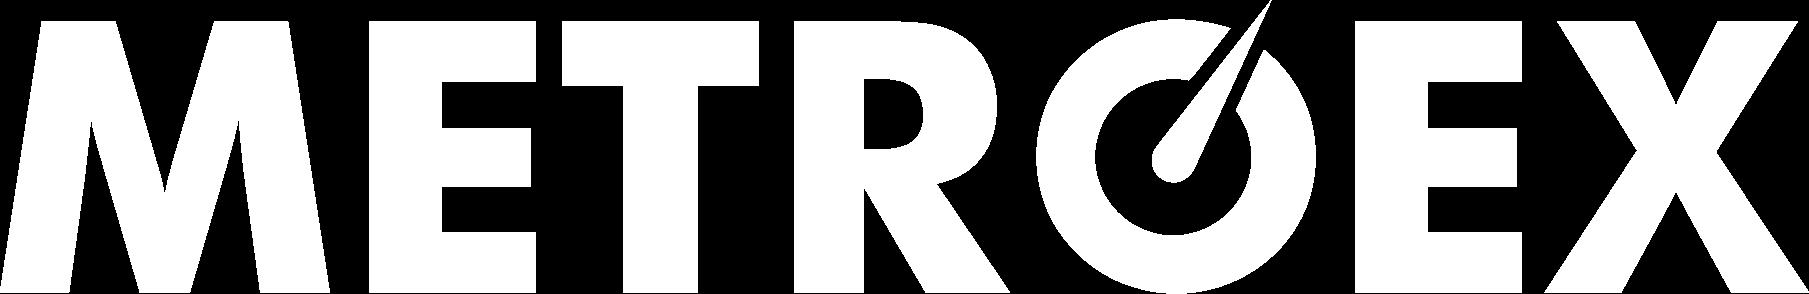 Metroex-Logo-Oficial-branco